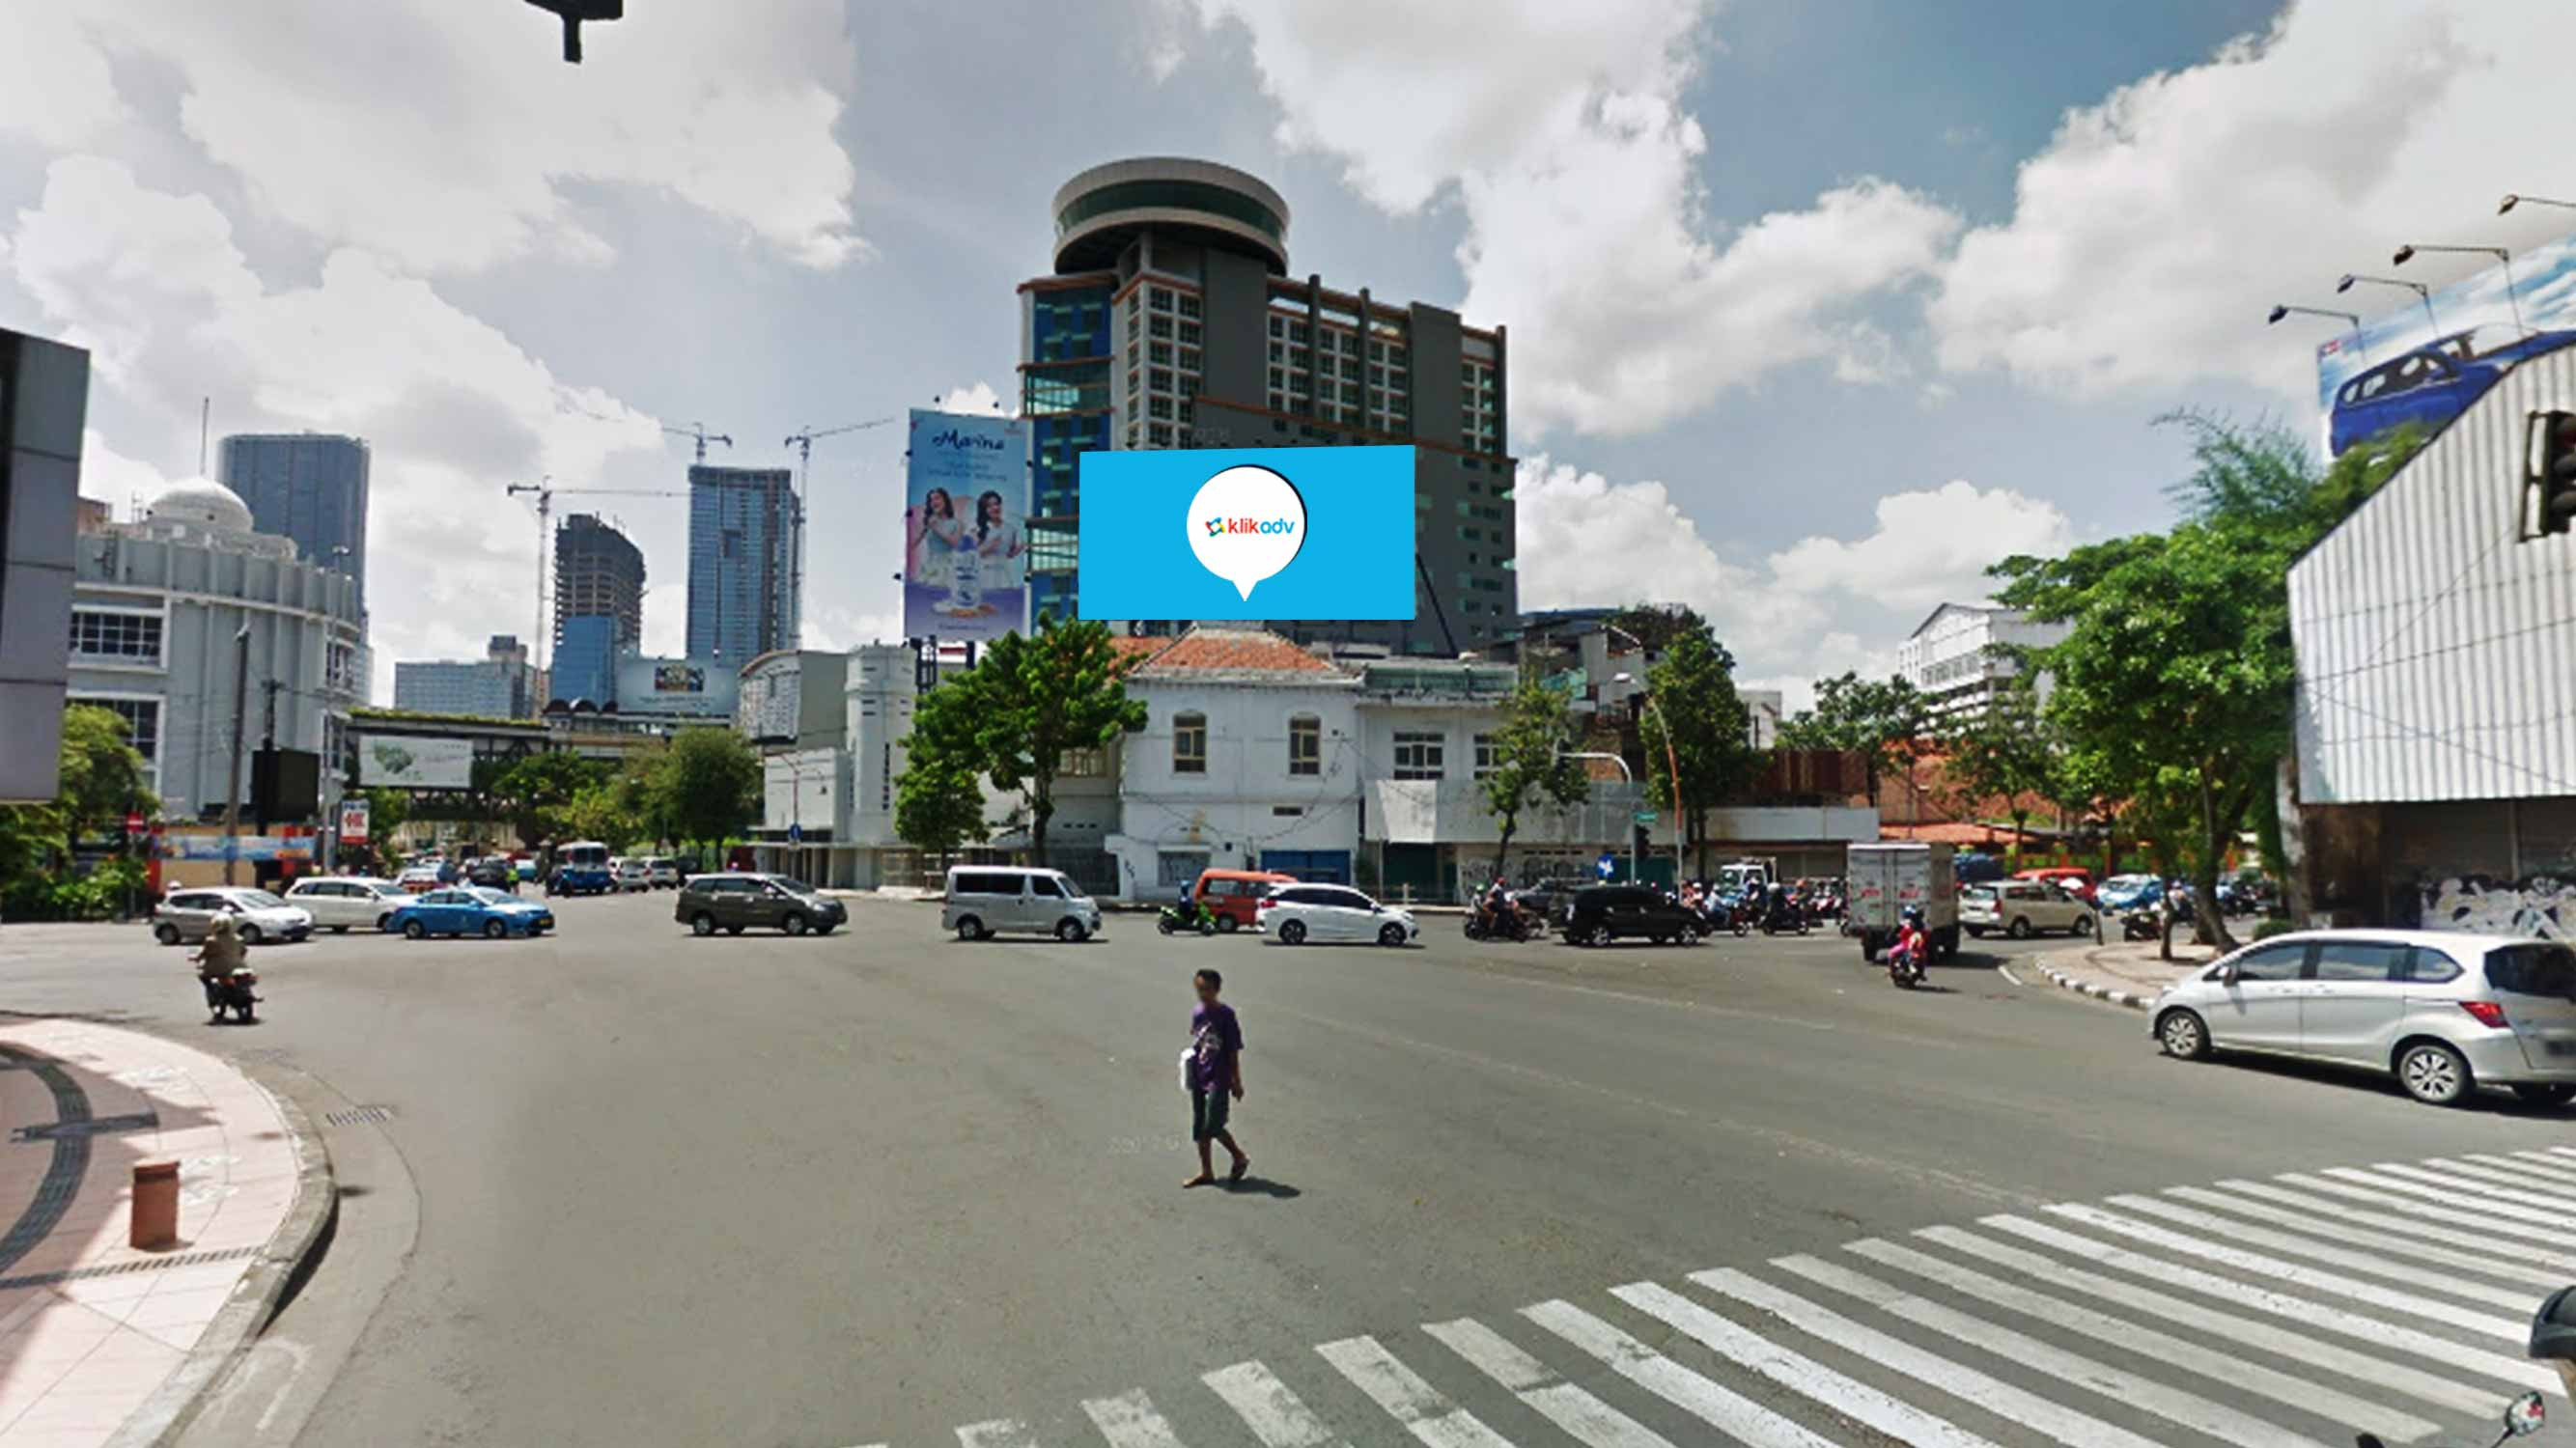 Sewa Billboard Jawa Timur Kota Surabaya Jl Praban Perempatan Tunjungan